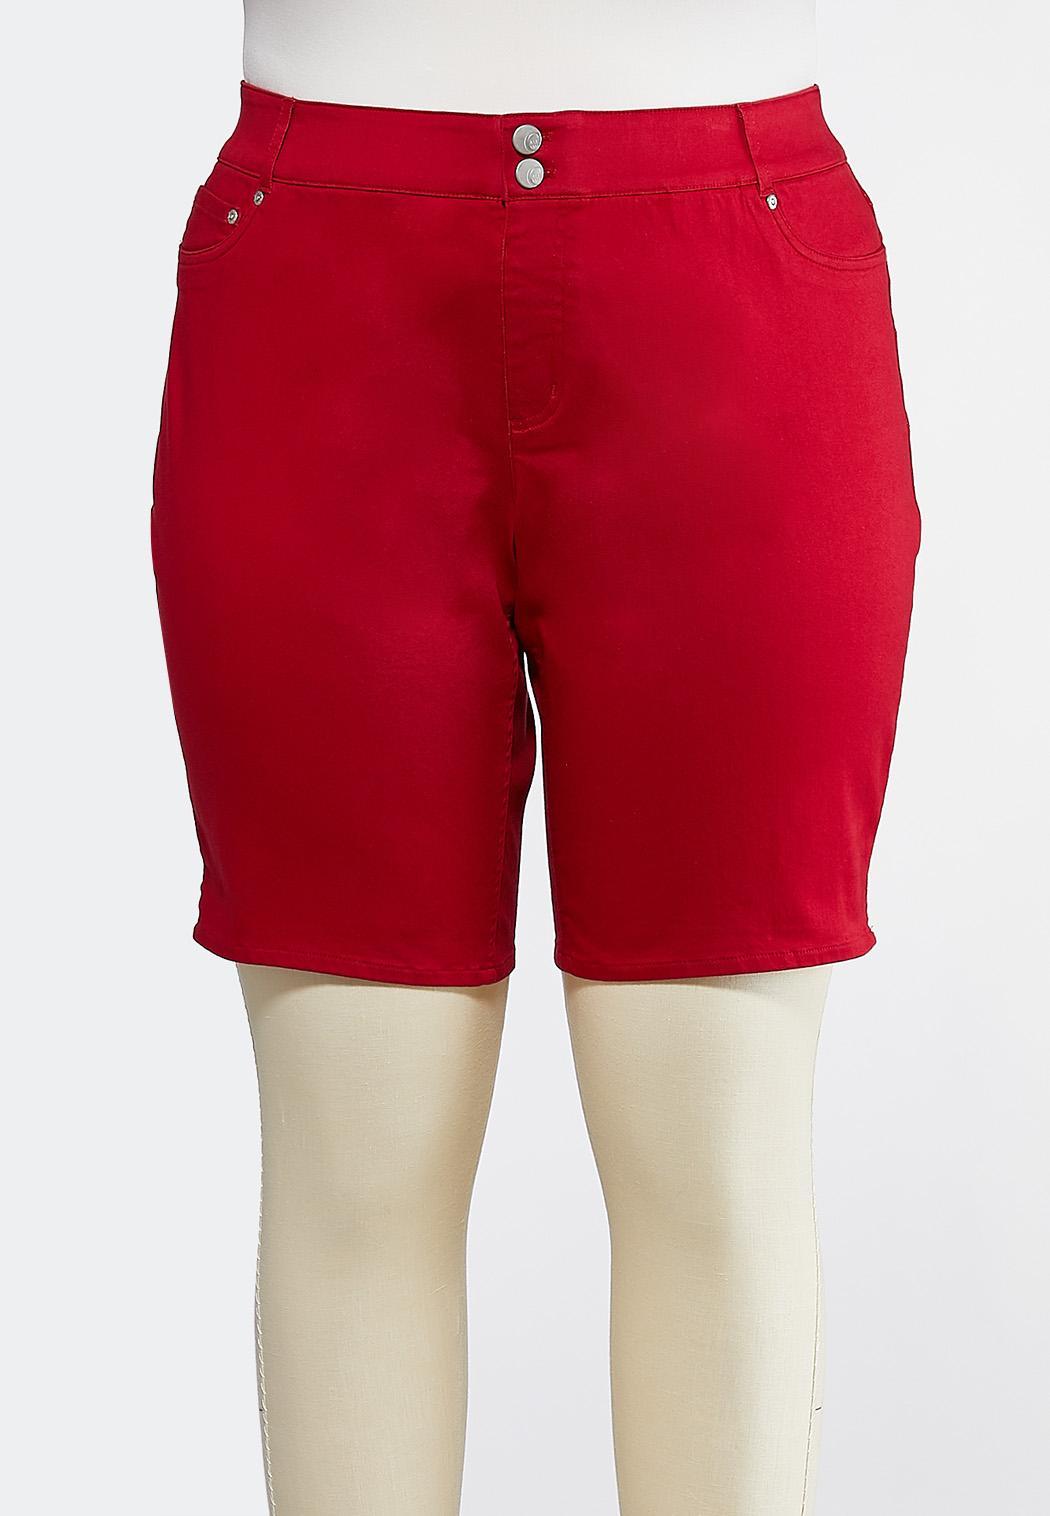 Plus Size Curvy Red Denim Bermuda Shorts